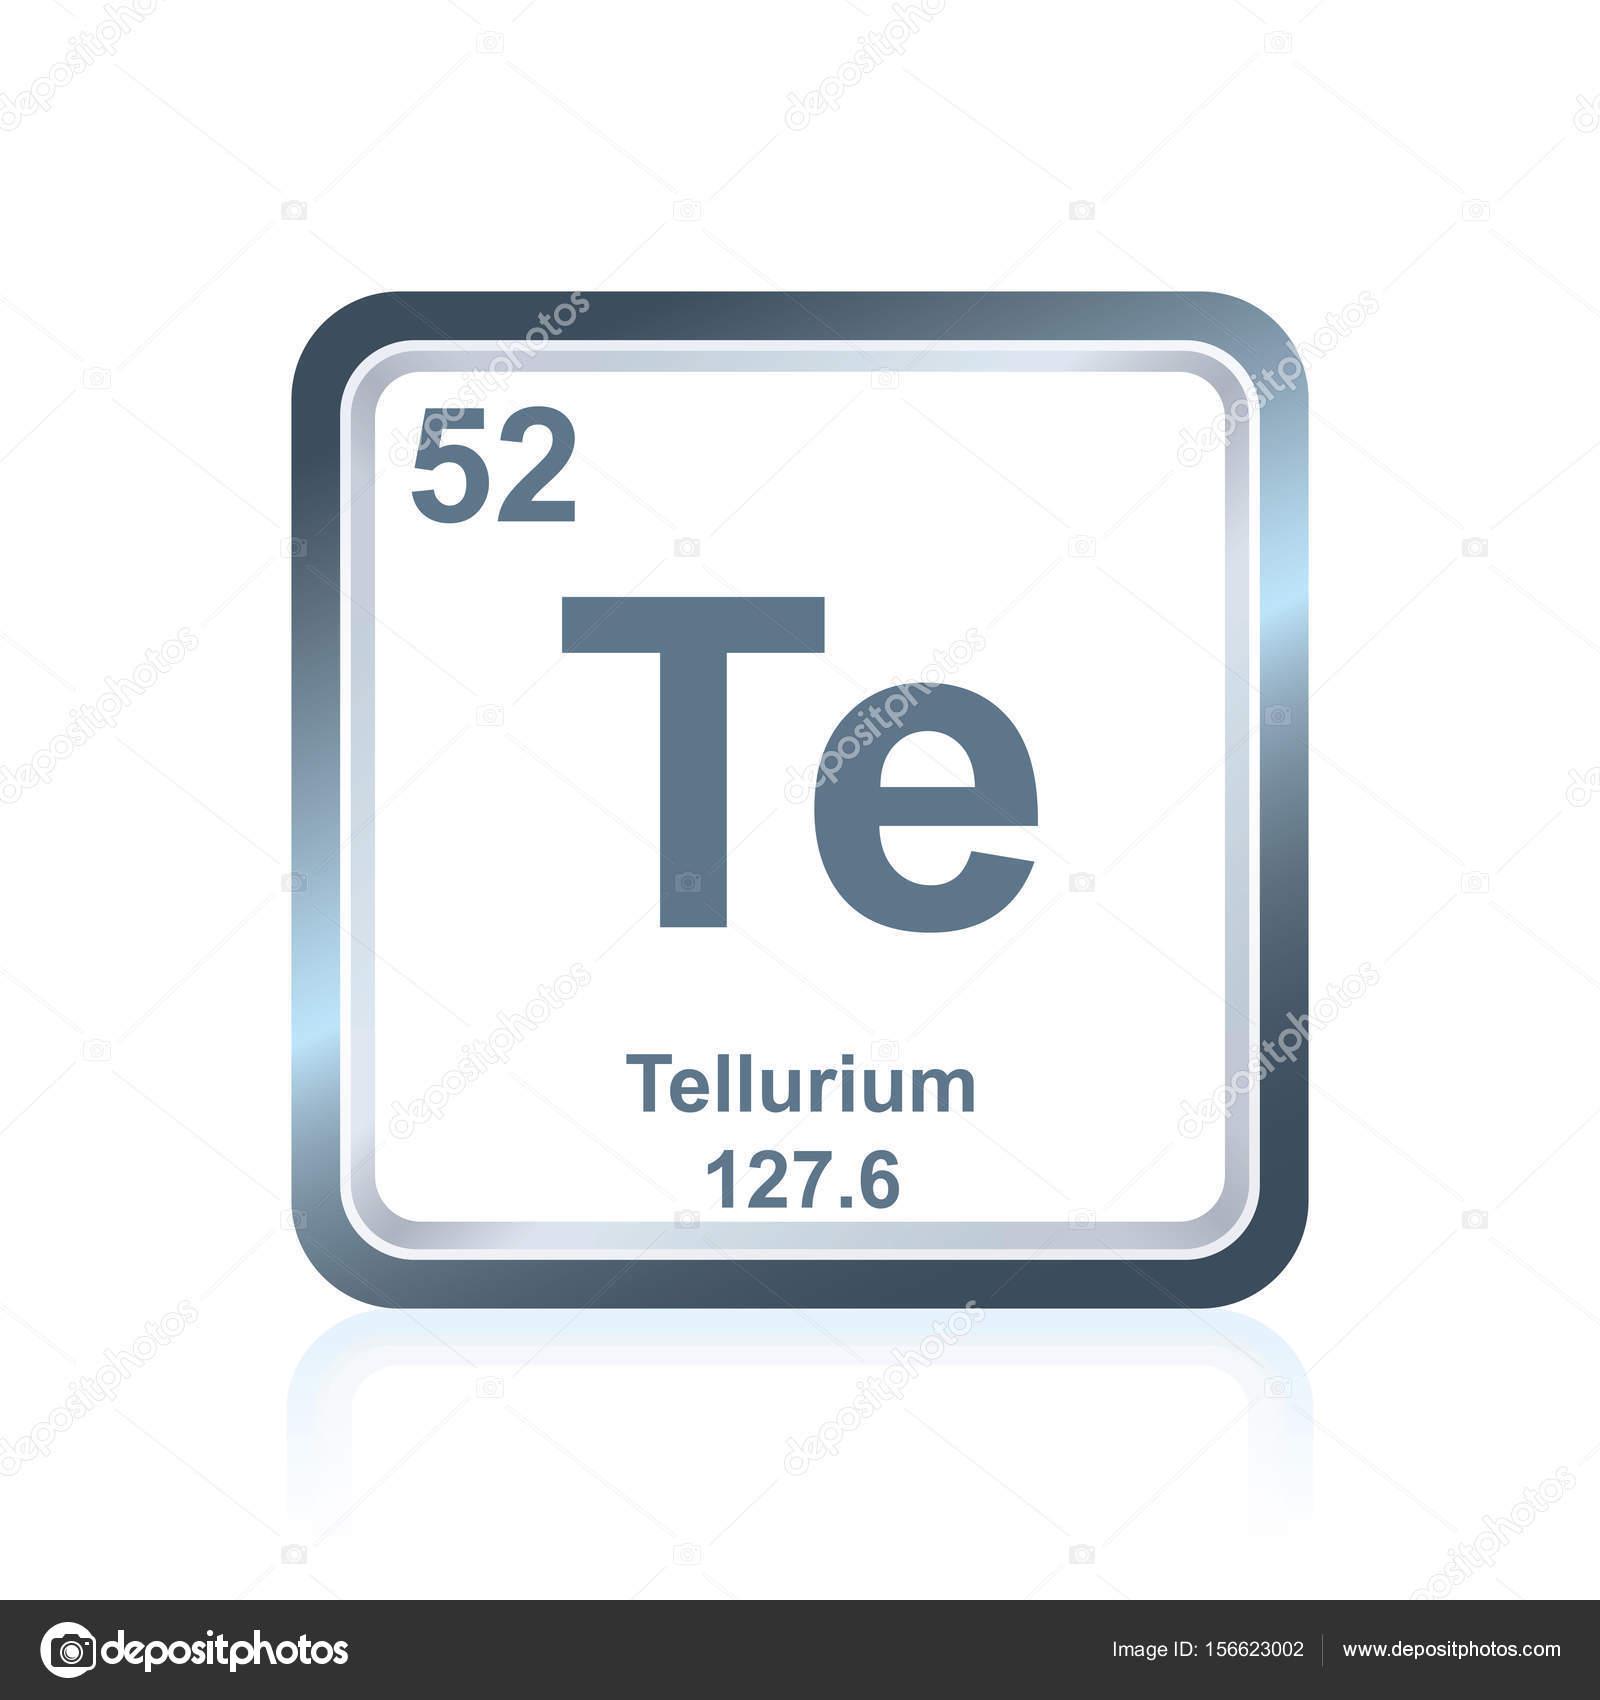 Telurio de elemento qumico de la tabla peridica archivo imgenes telurio de elemento qumico de la tabla peridica archivo imgenes vectoriales urtaz Gallery